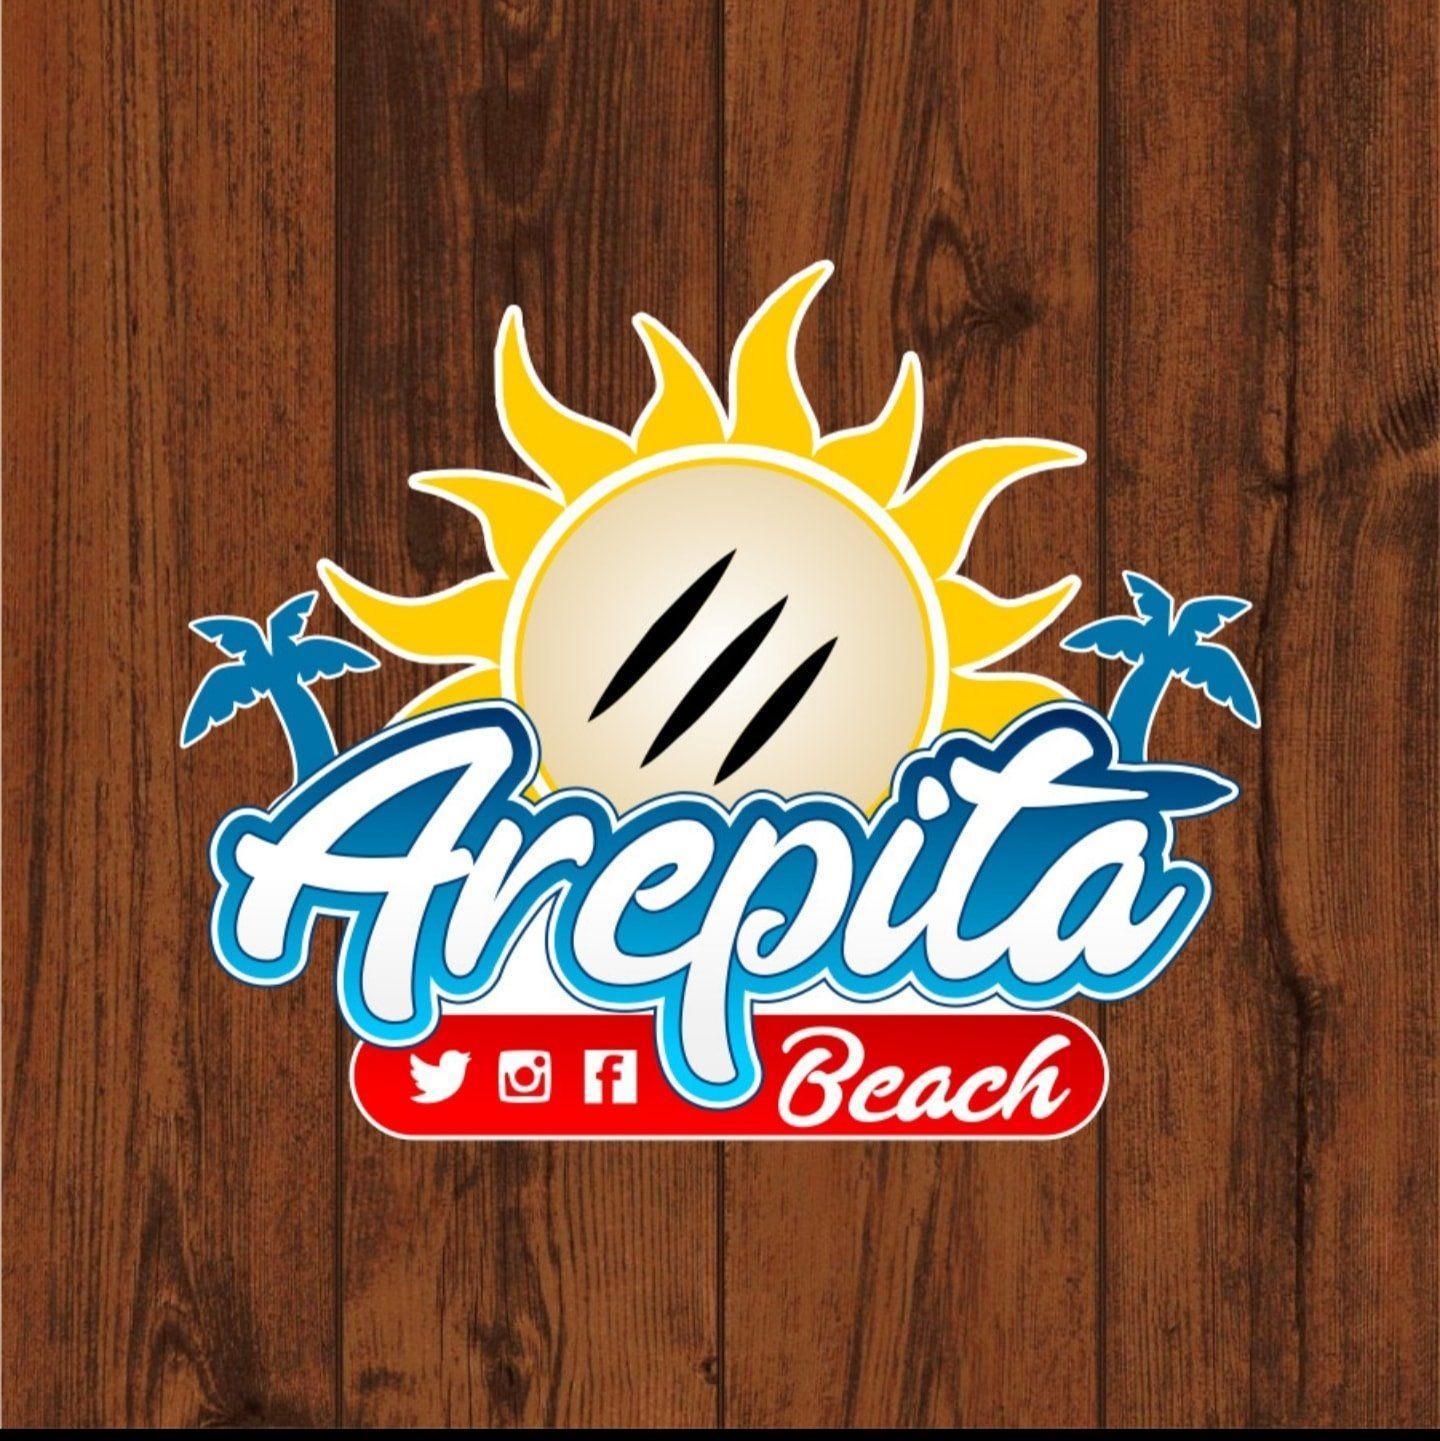 Arepita Beach